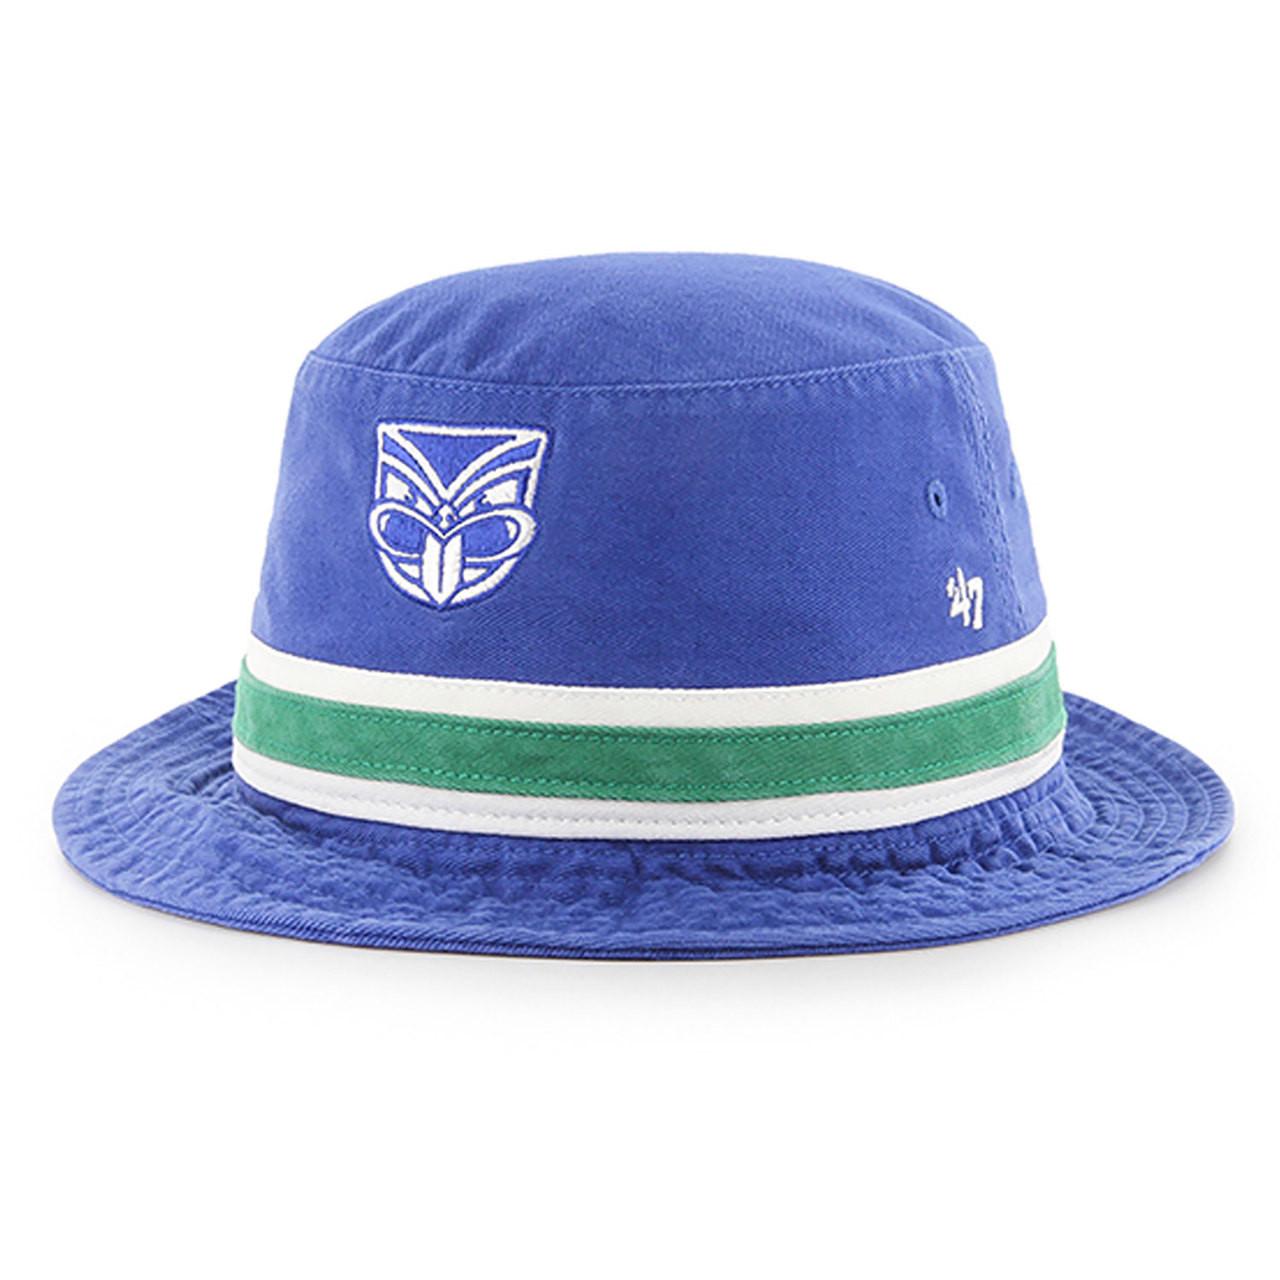 2019 Warriors 47 Brand Striped Bucket Hat Warriors Superstore